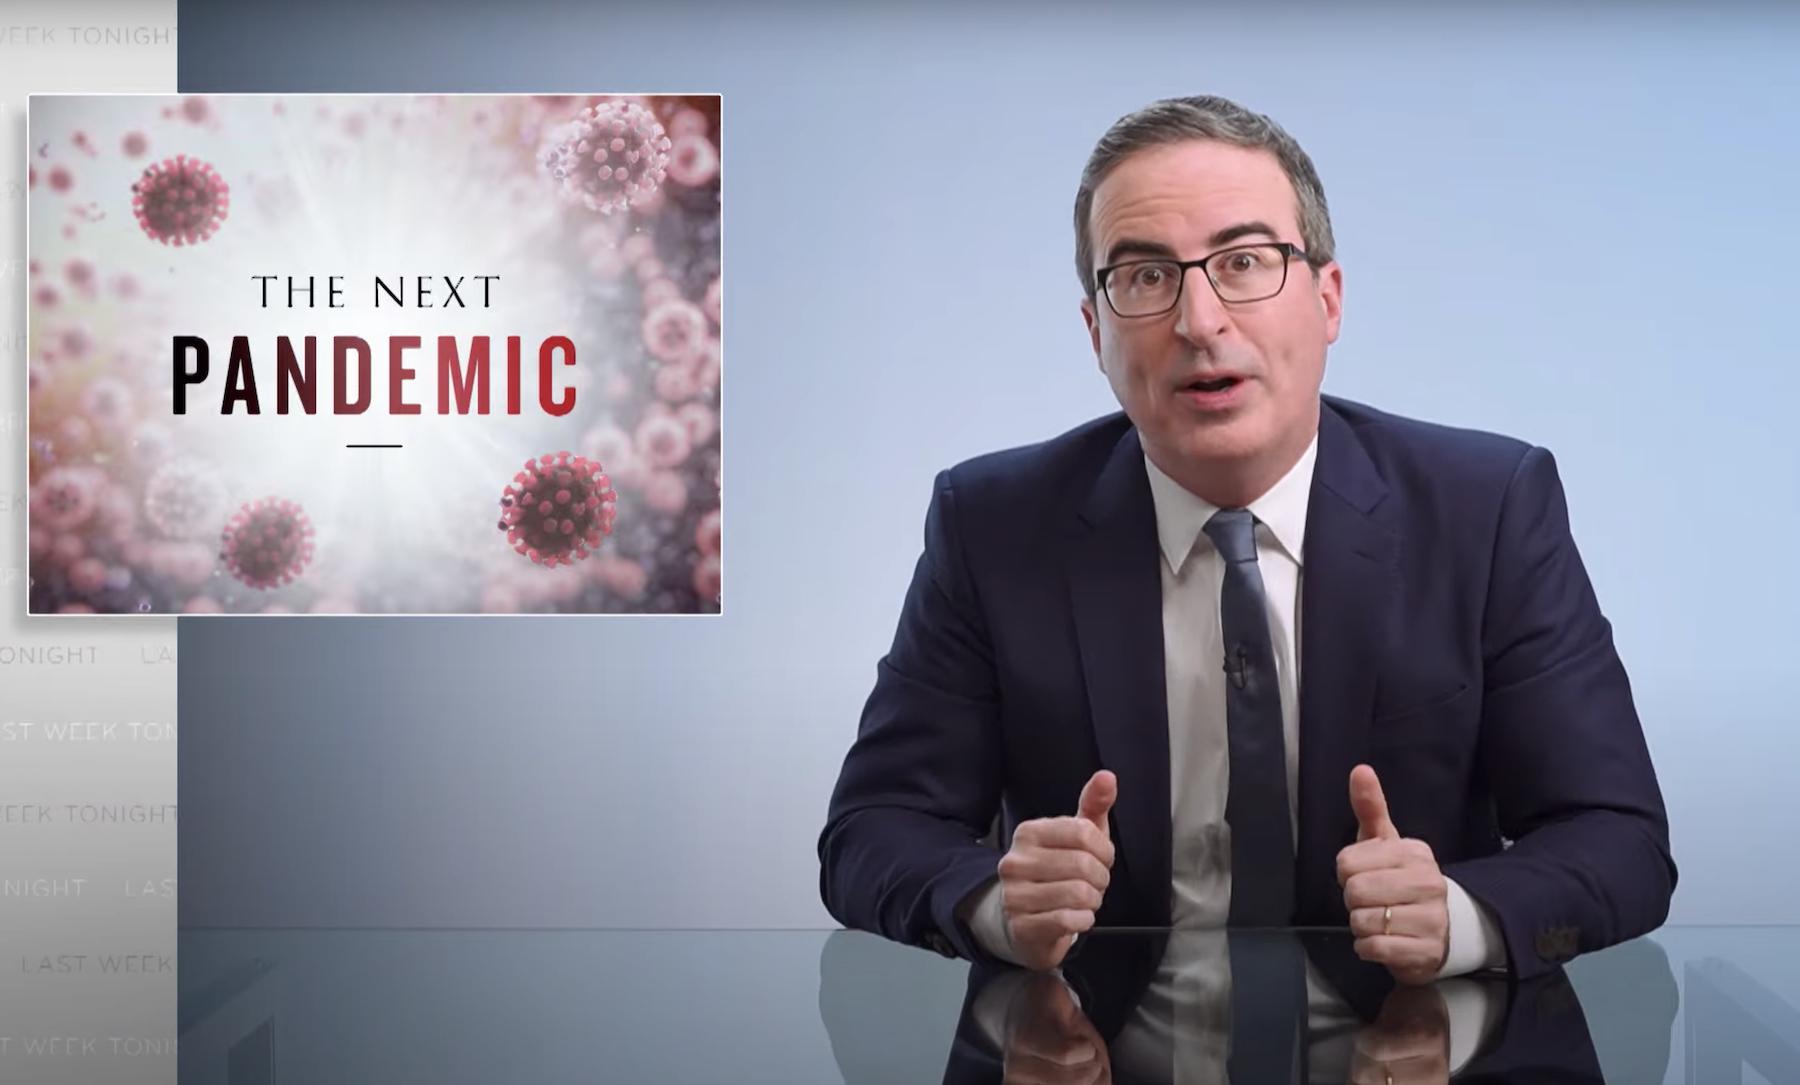 John Oliver Talks Possibility of 'Next' Pandemic on 'Last Week Tonight' - Rolling Stone